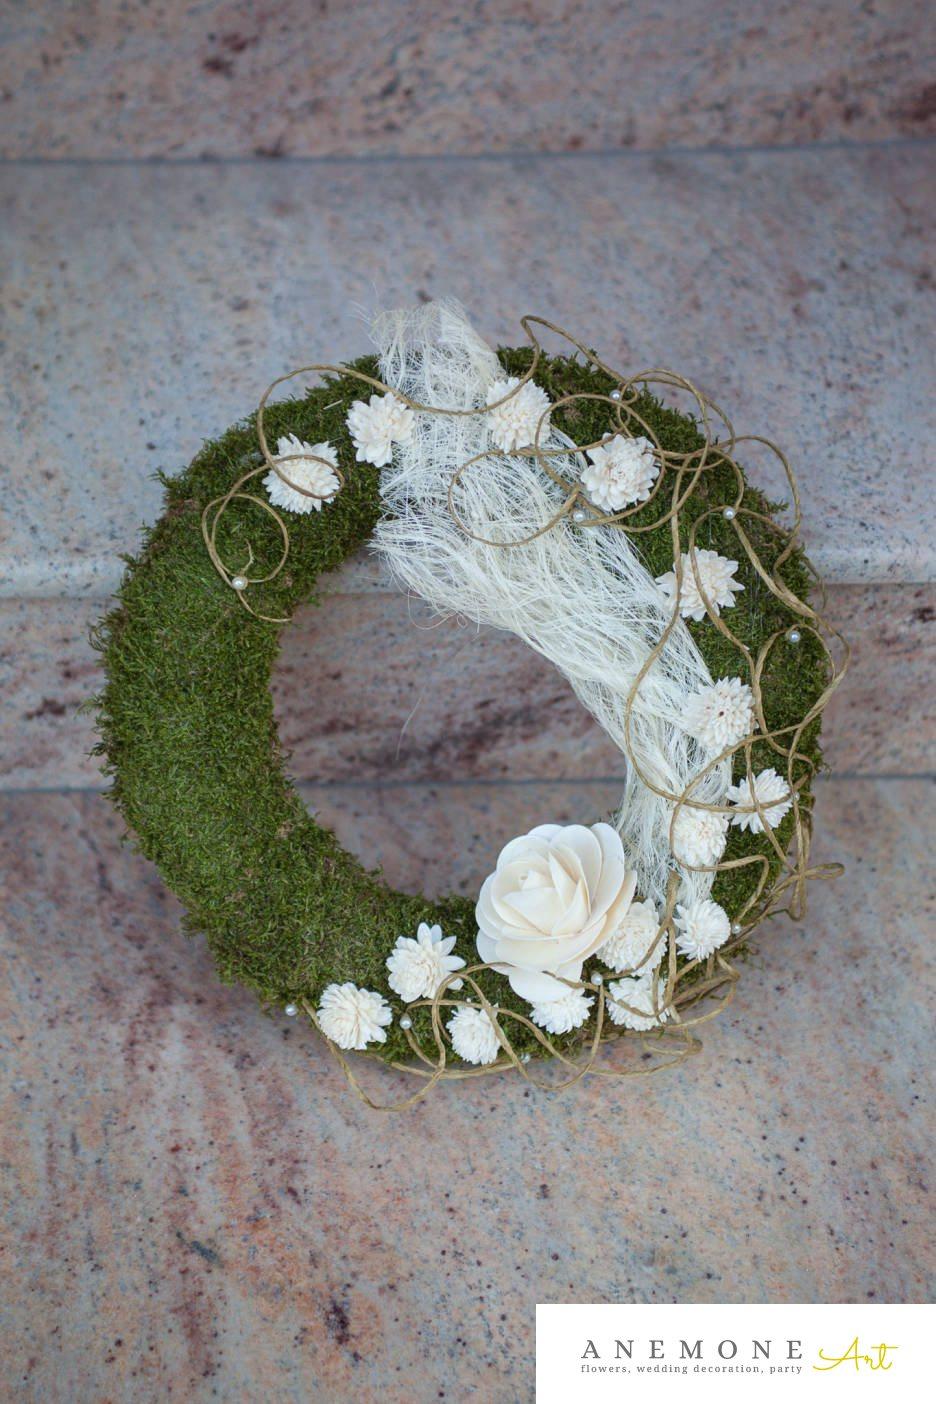 Poza, foto cu Flori de nunta alb, coroana funerara, muschi, perle, rotund, trandafiri in Arad, Timisoara, Oradea (wedding flowers, bouquets) nunta Arad, Timisoara, Oradea